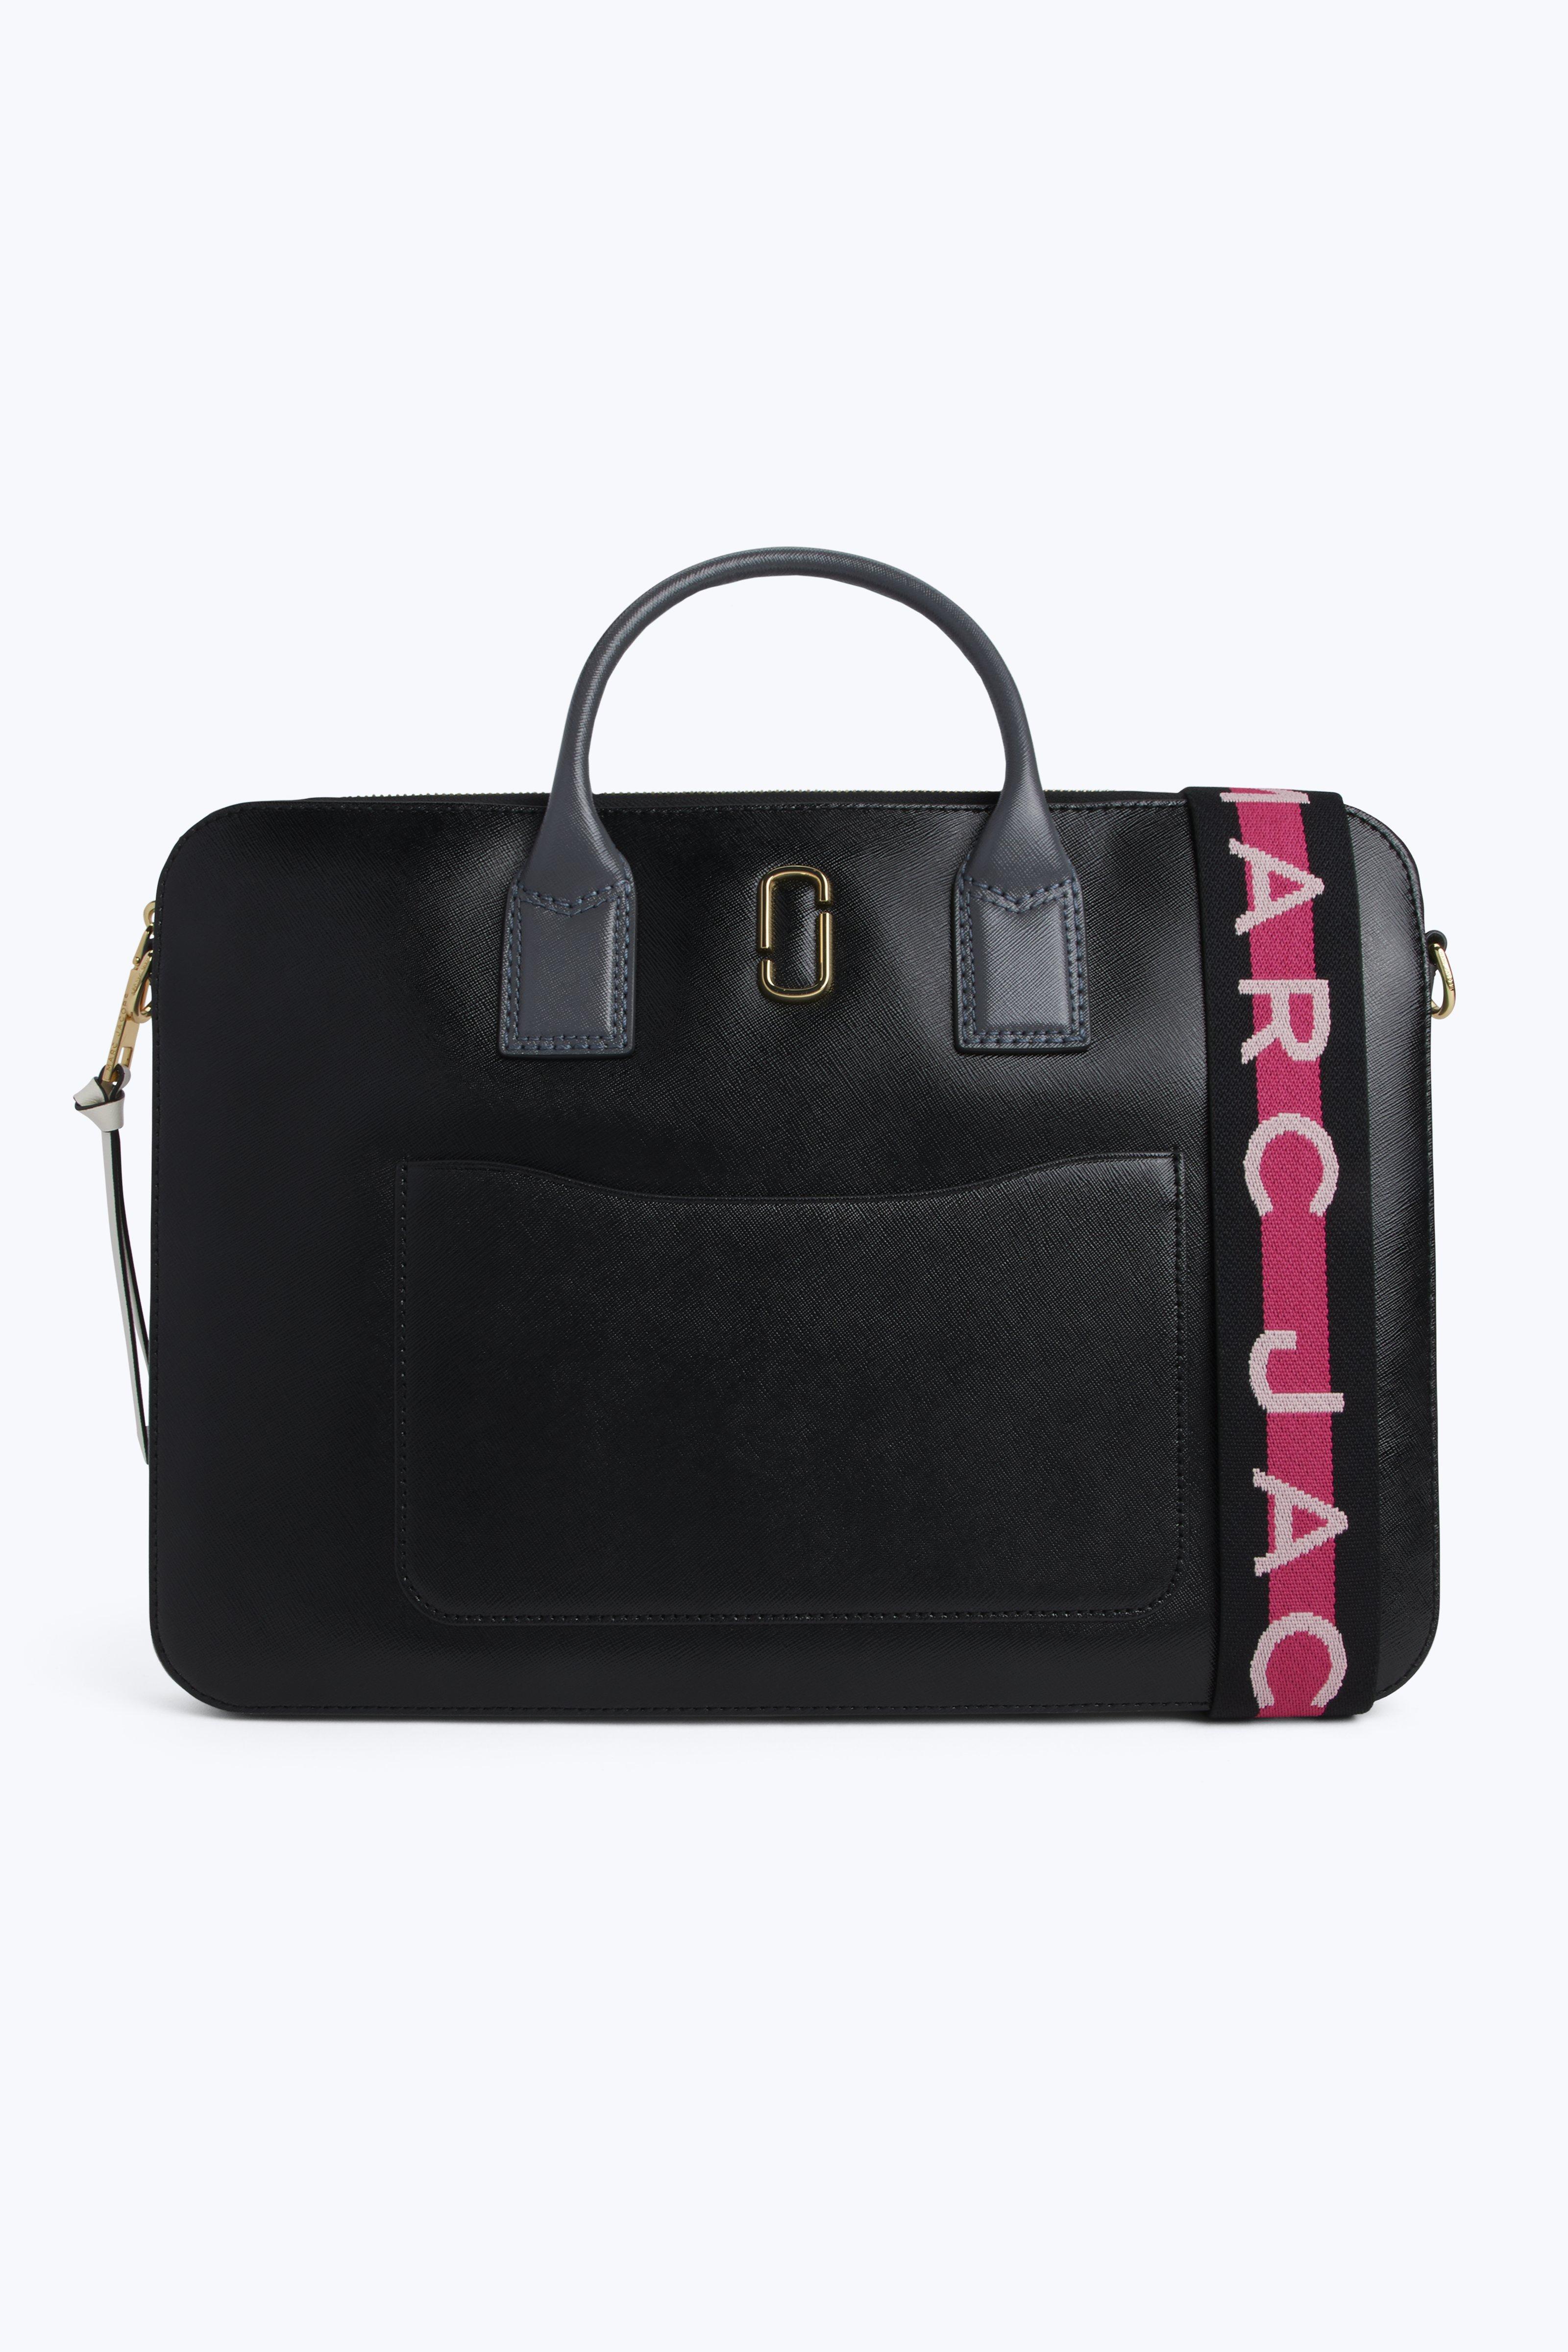 marc by marc jacobs liten väska